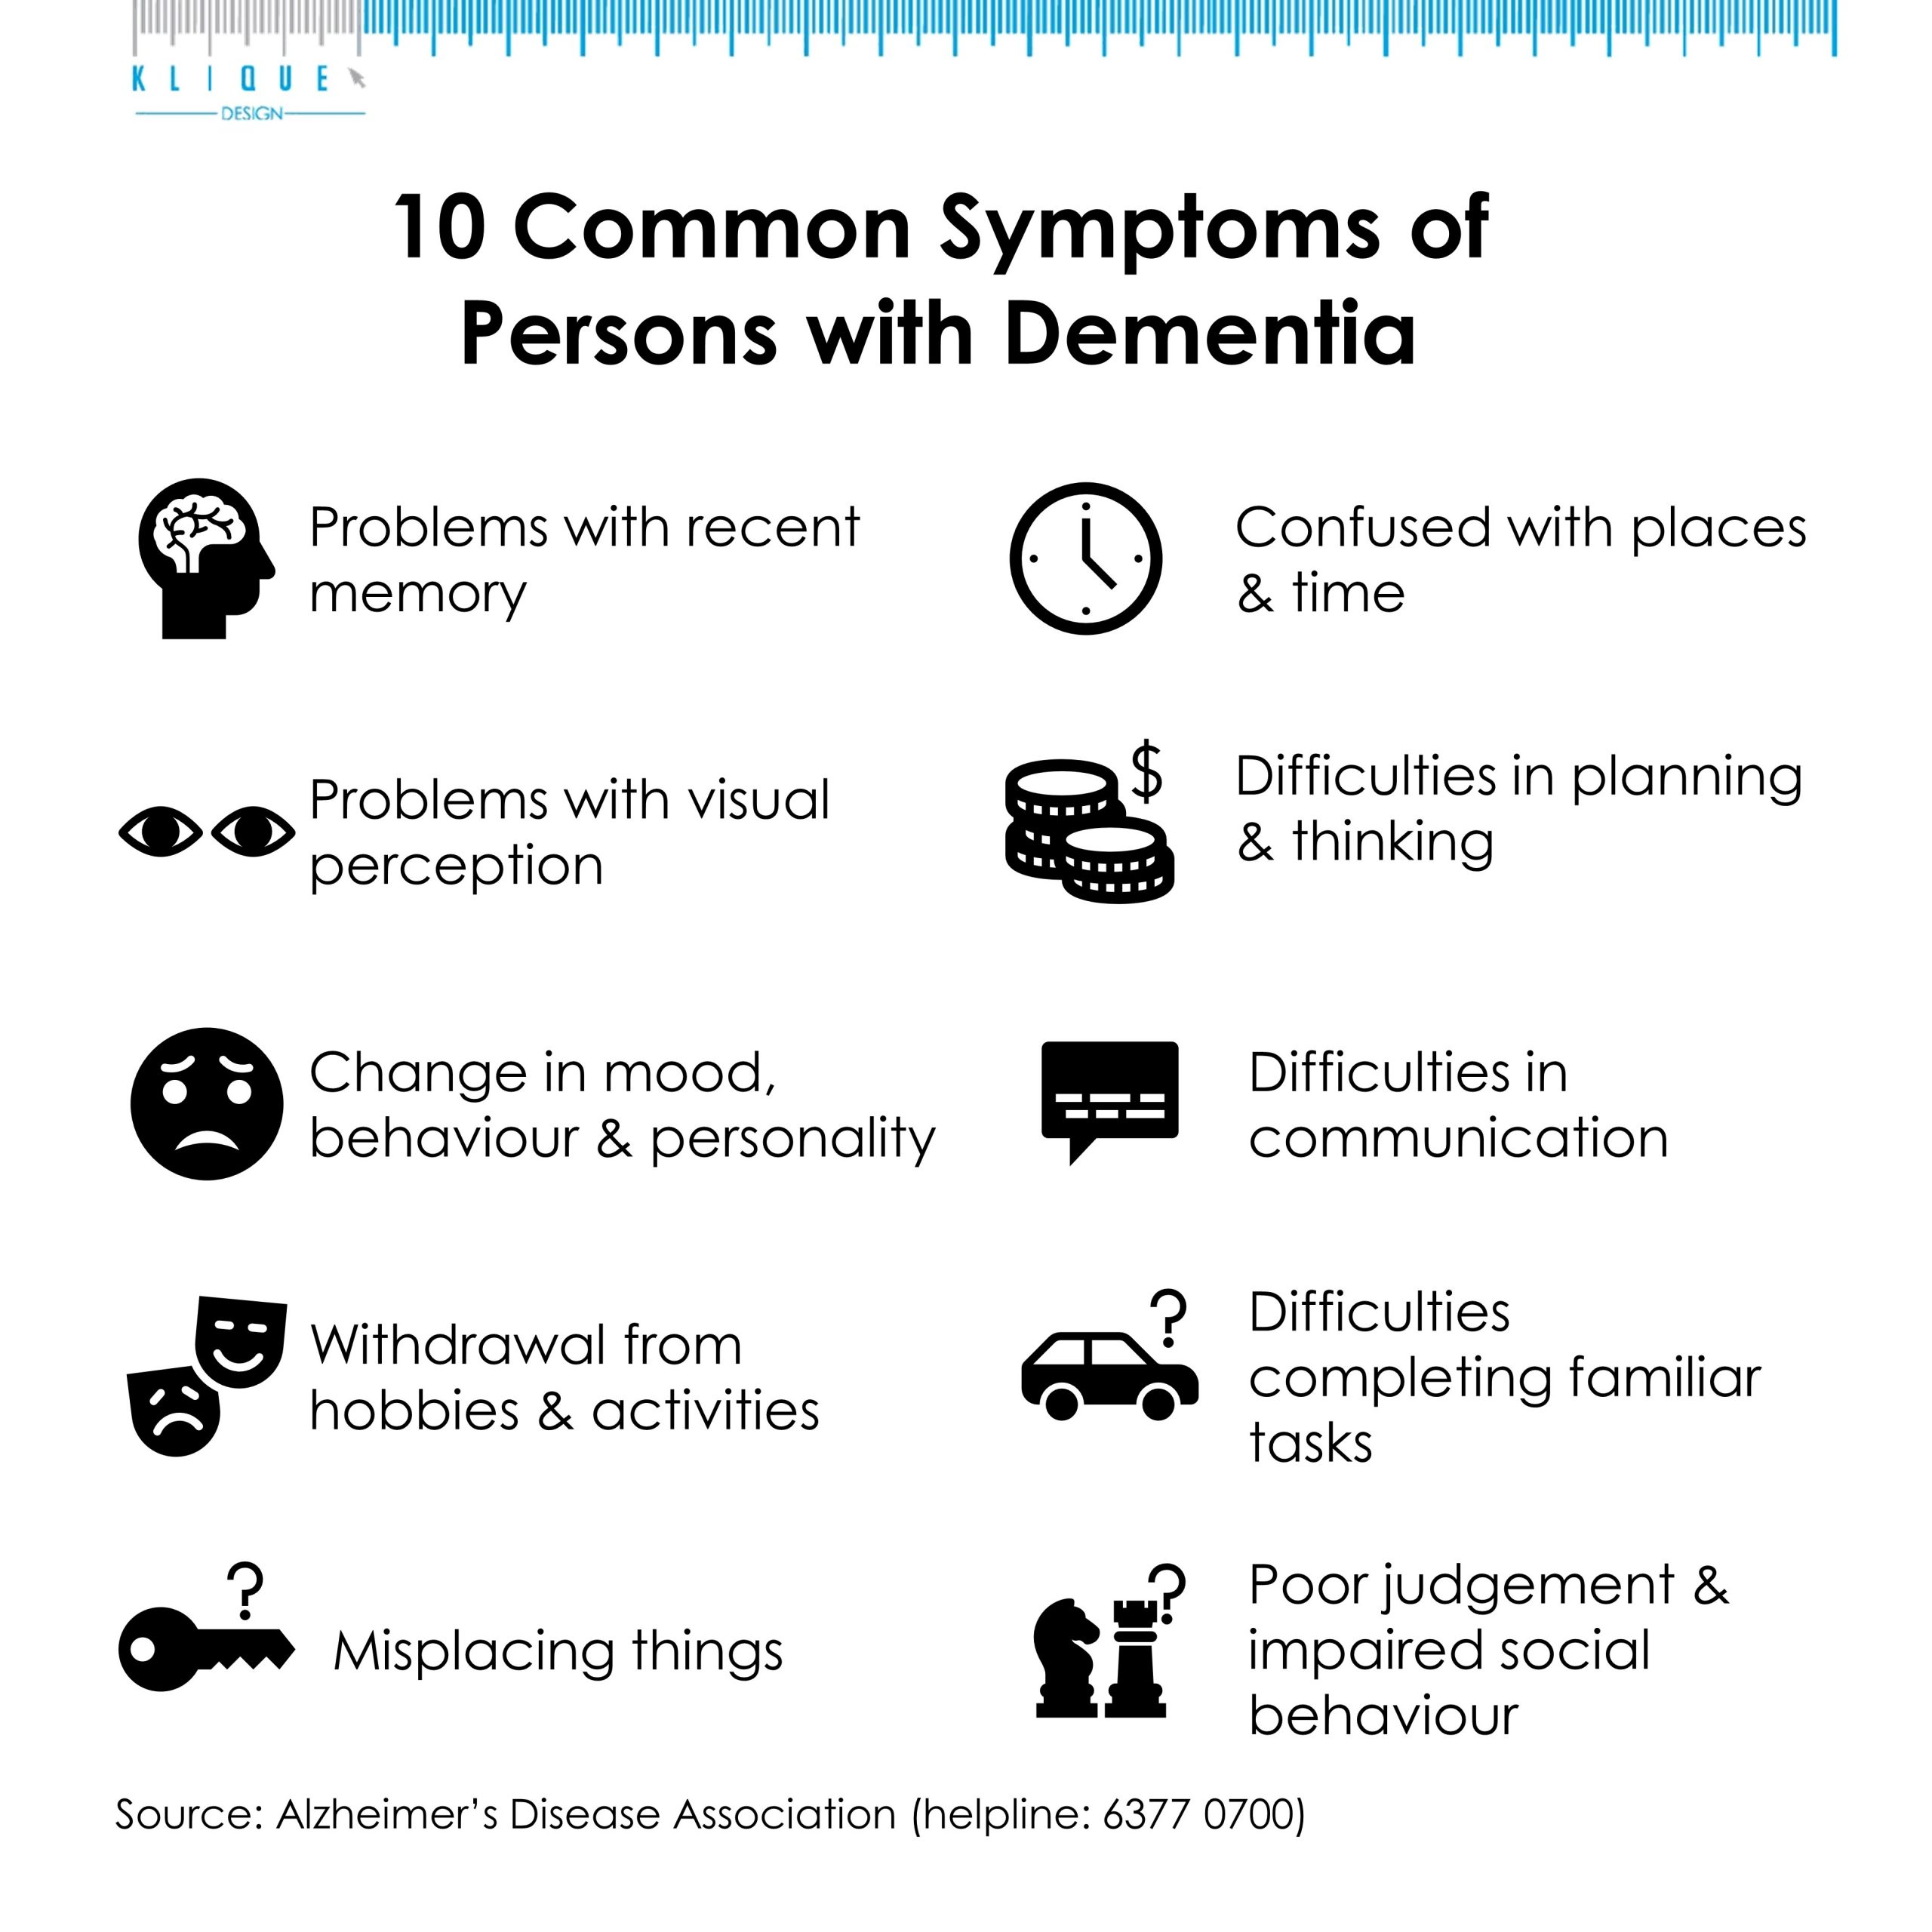 10 common symptoms of person with dementia